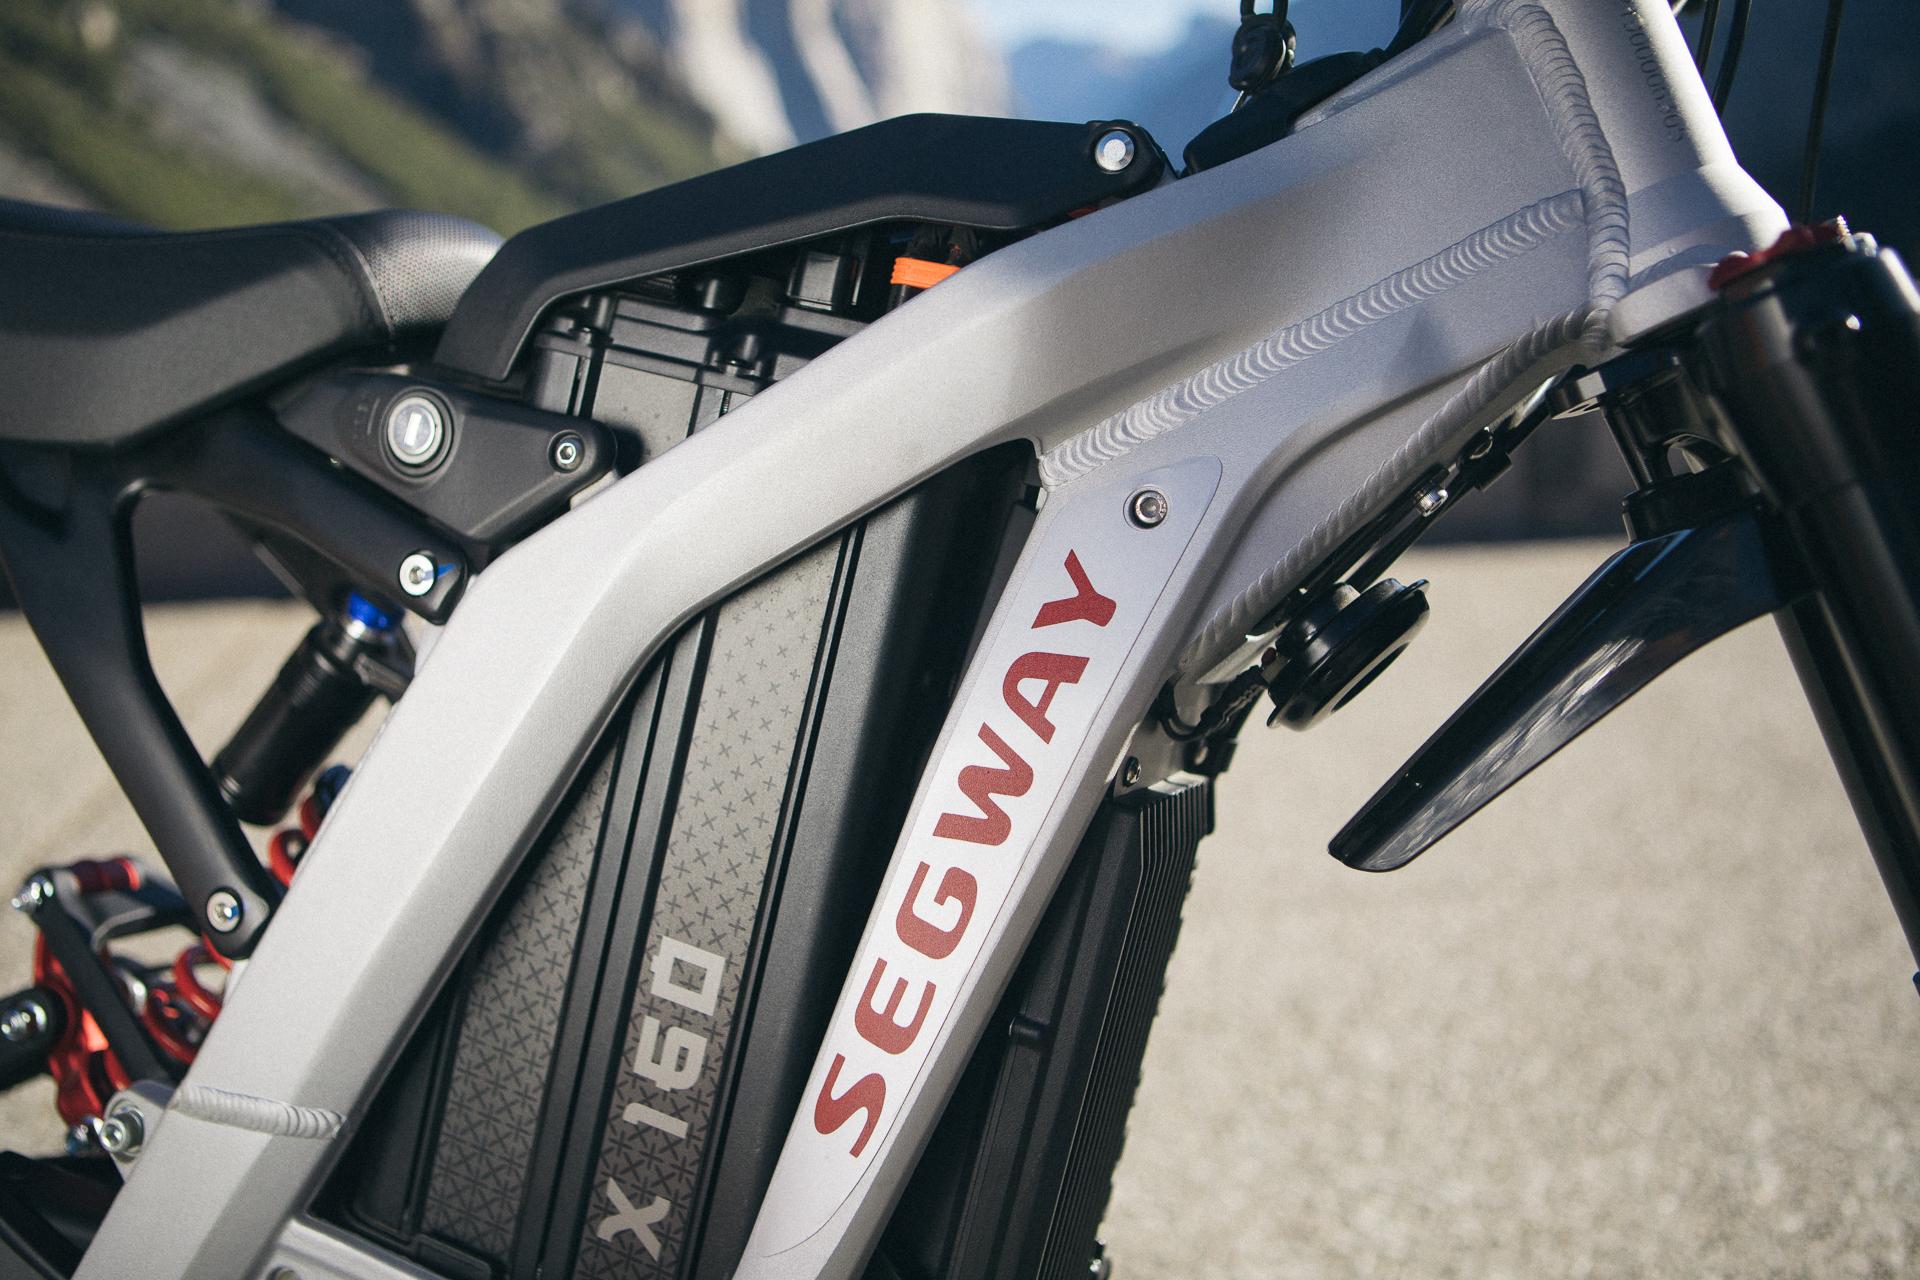 Segway-Ninebot now has an electric dirt bike | TechCrunch